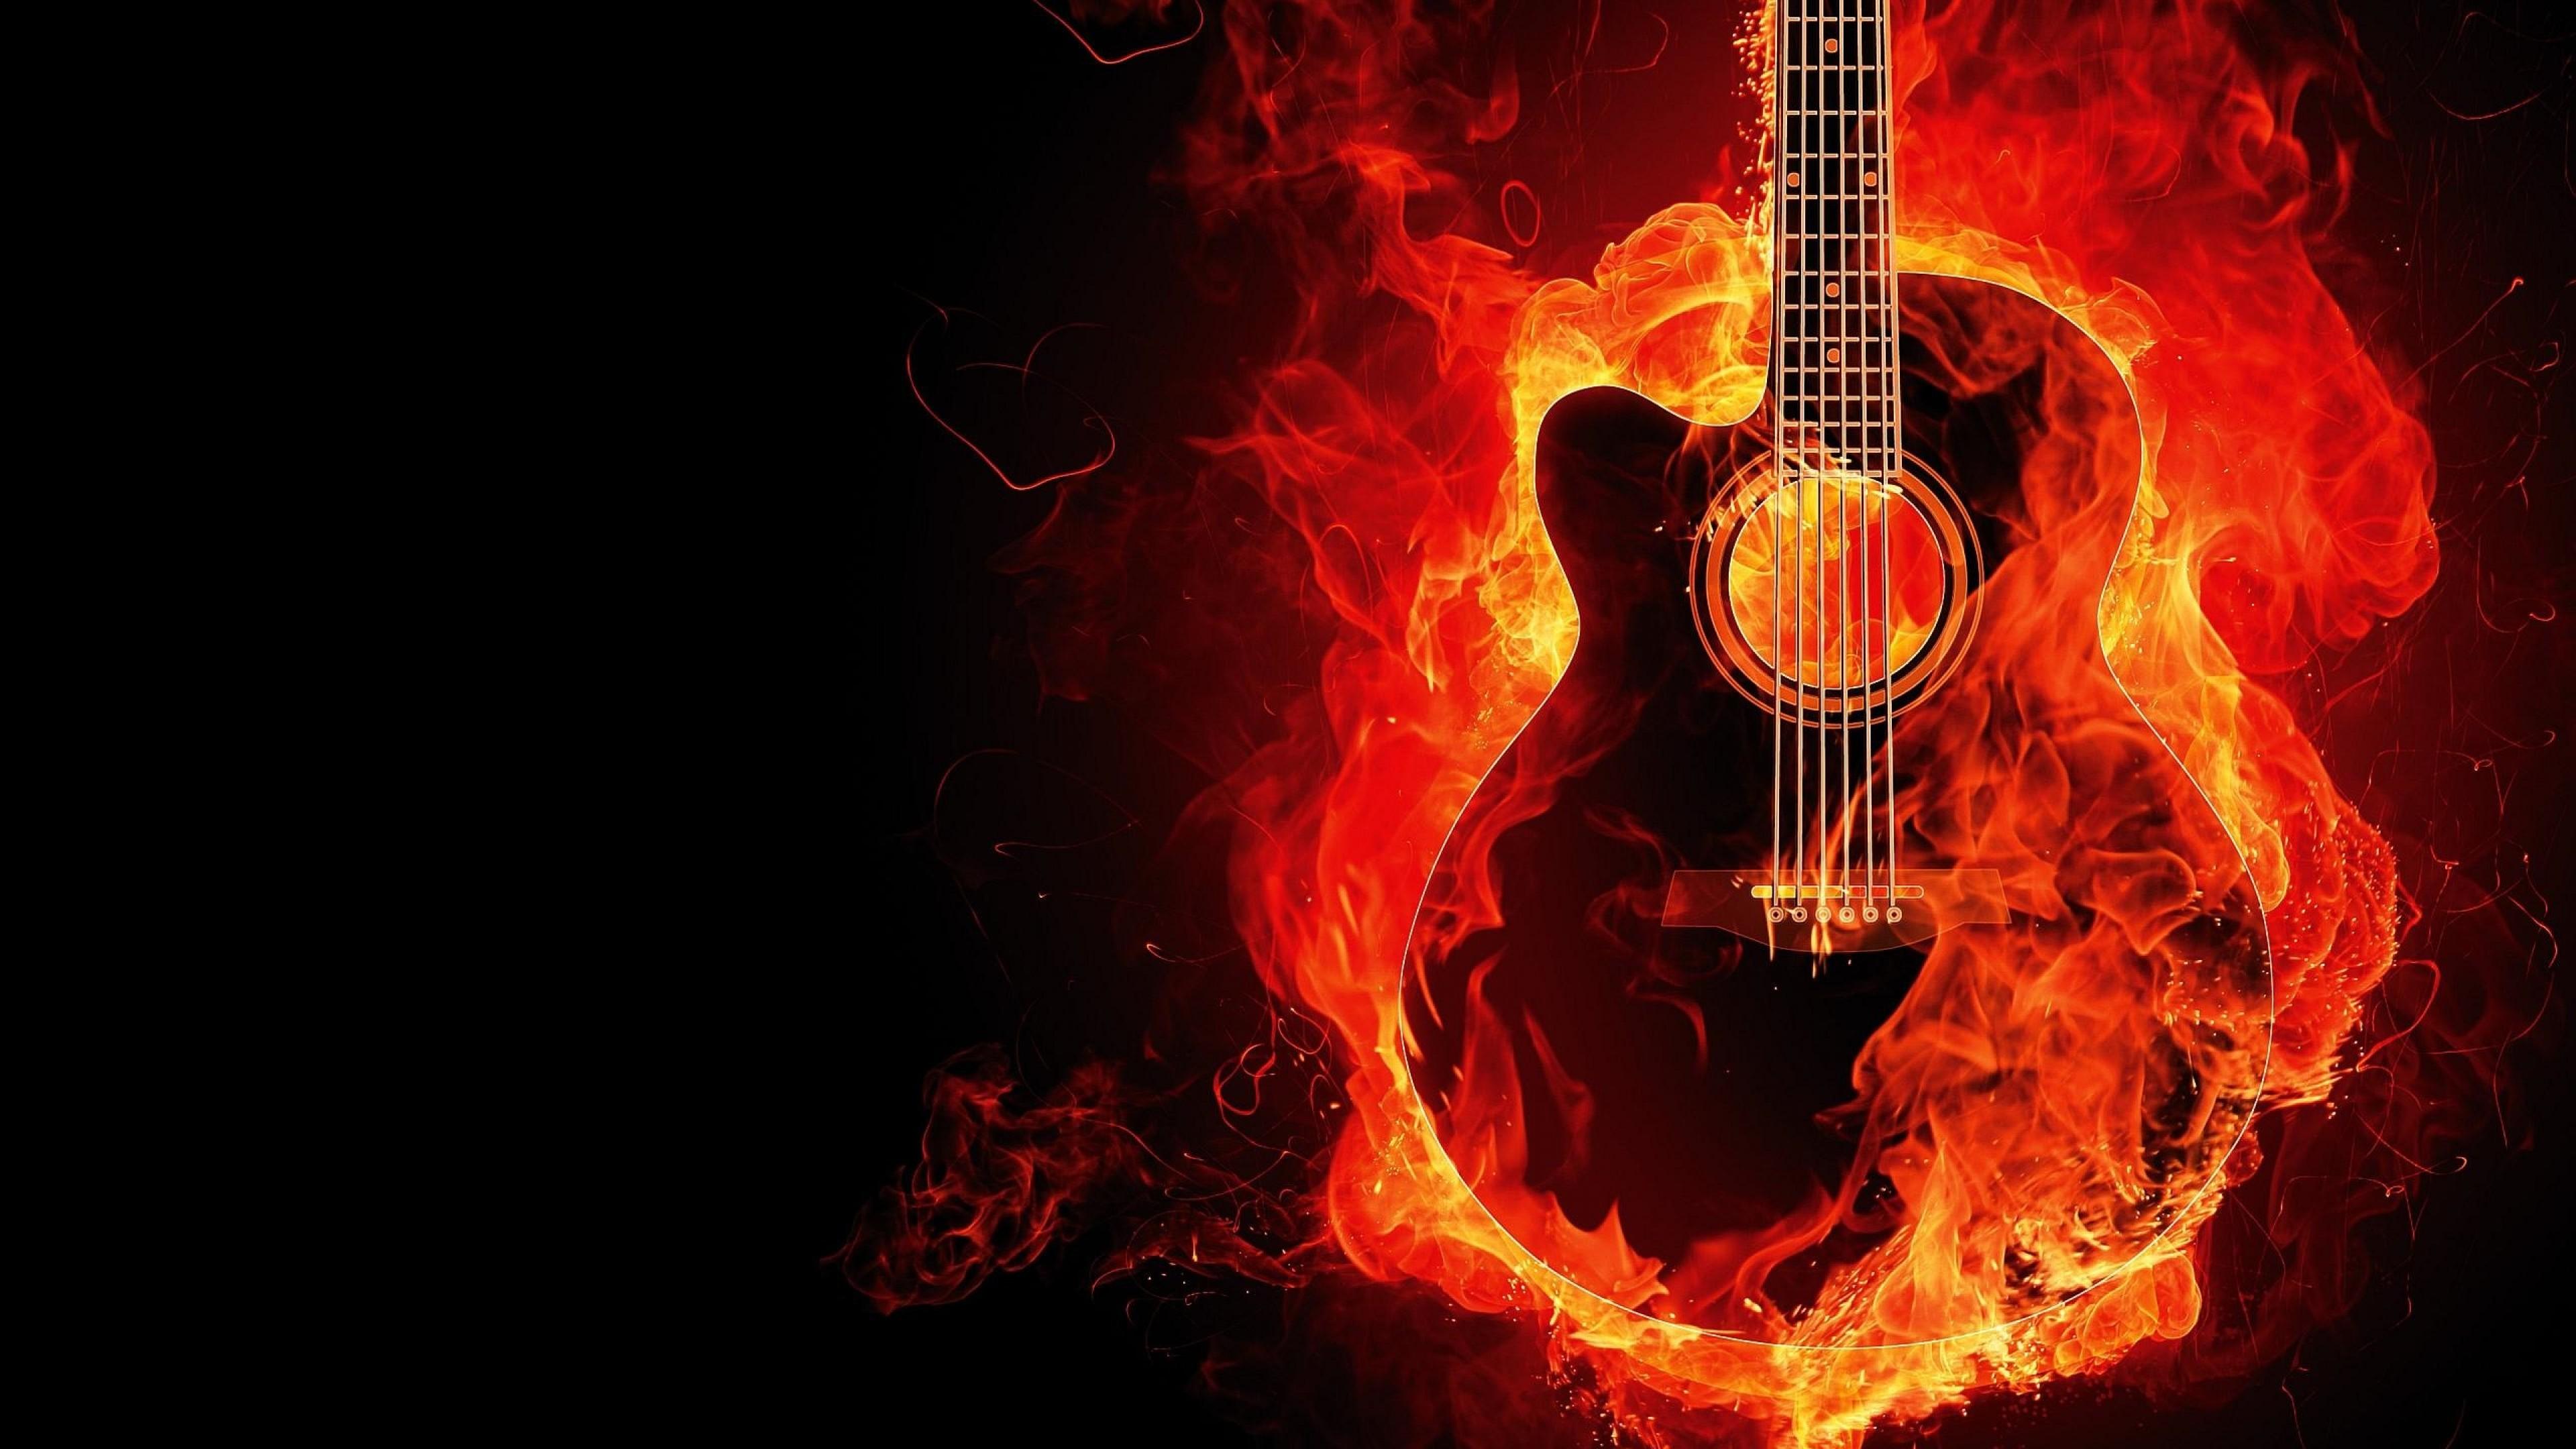 Download Fire Guitar Full Hd Wallpaper For Desktop And